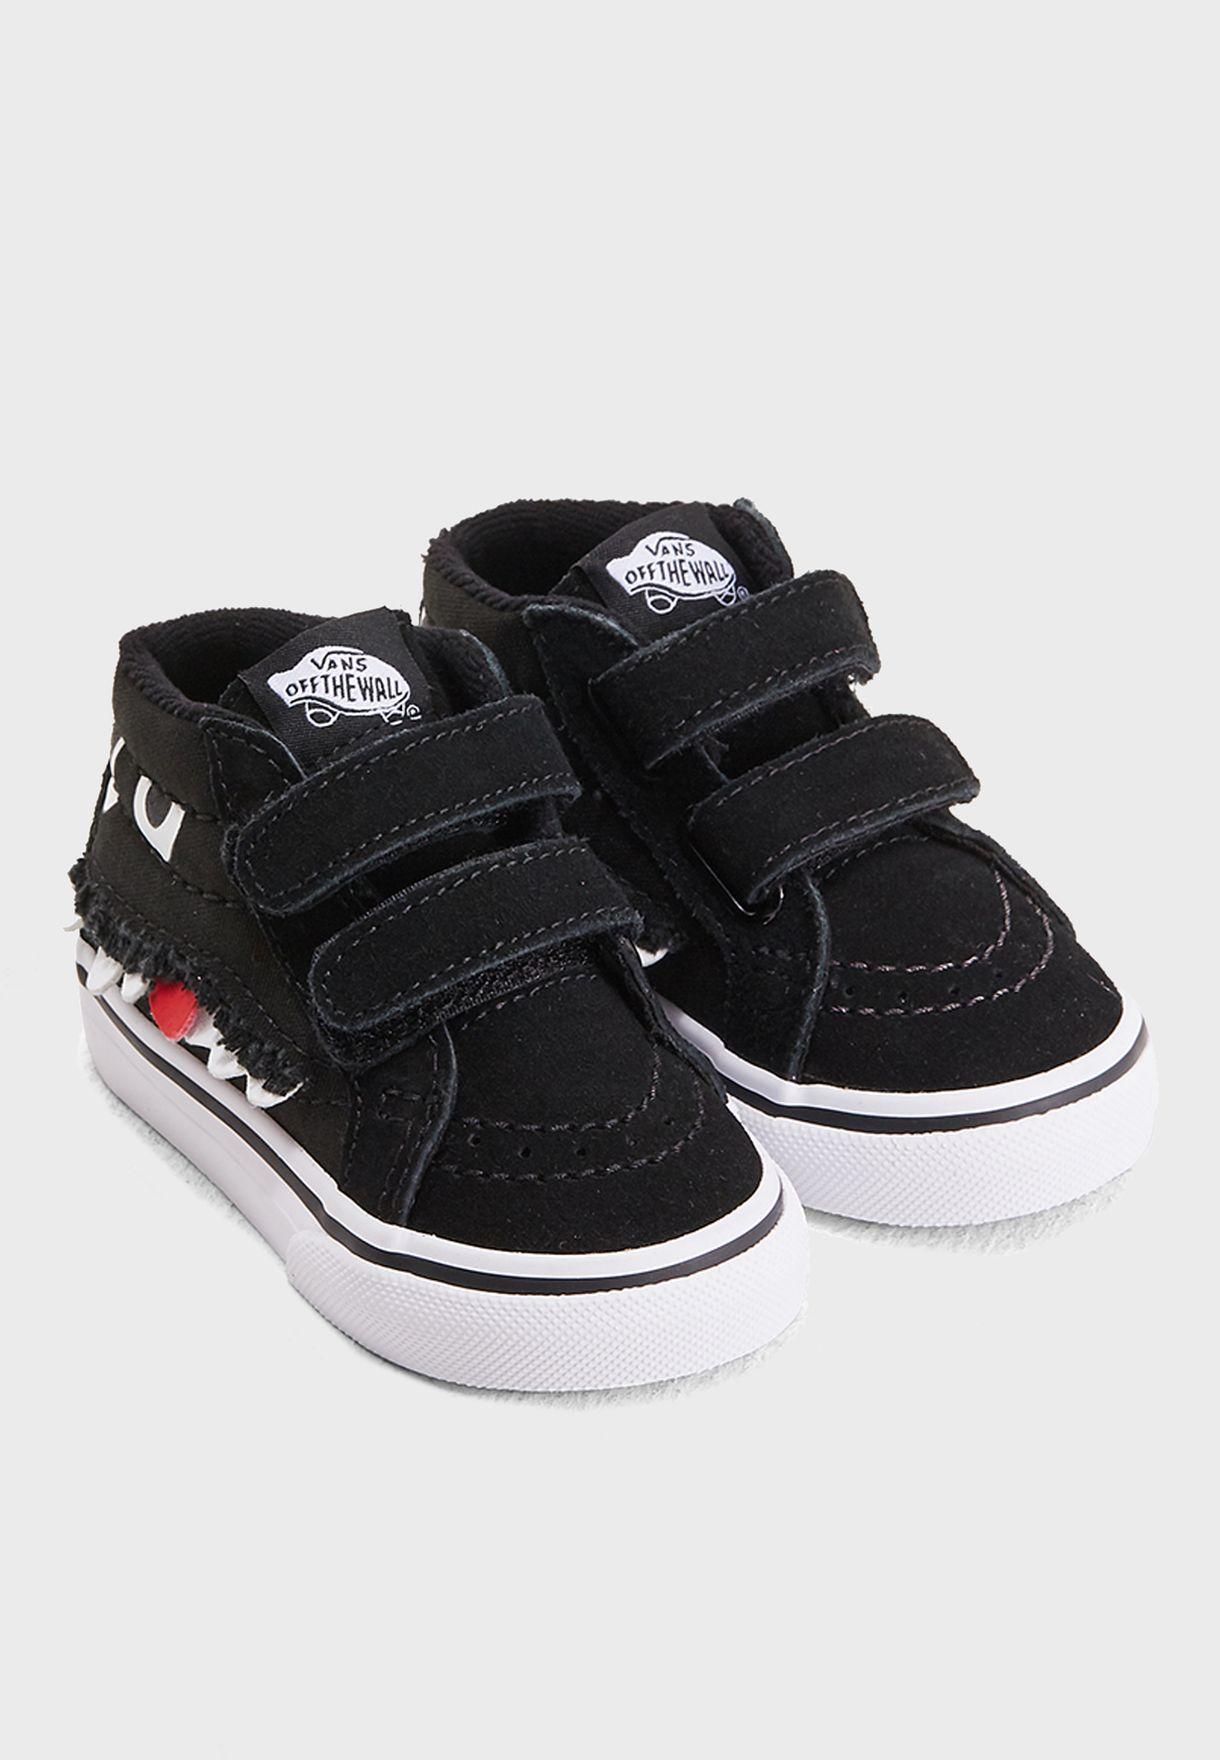 6d384705fe464 Shop Vans black Infant Monster Face SK8-Mid Reissue V 48JU4Q for ...